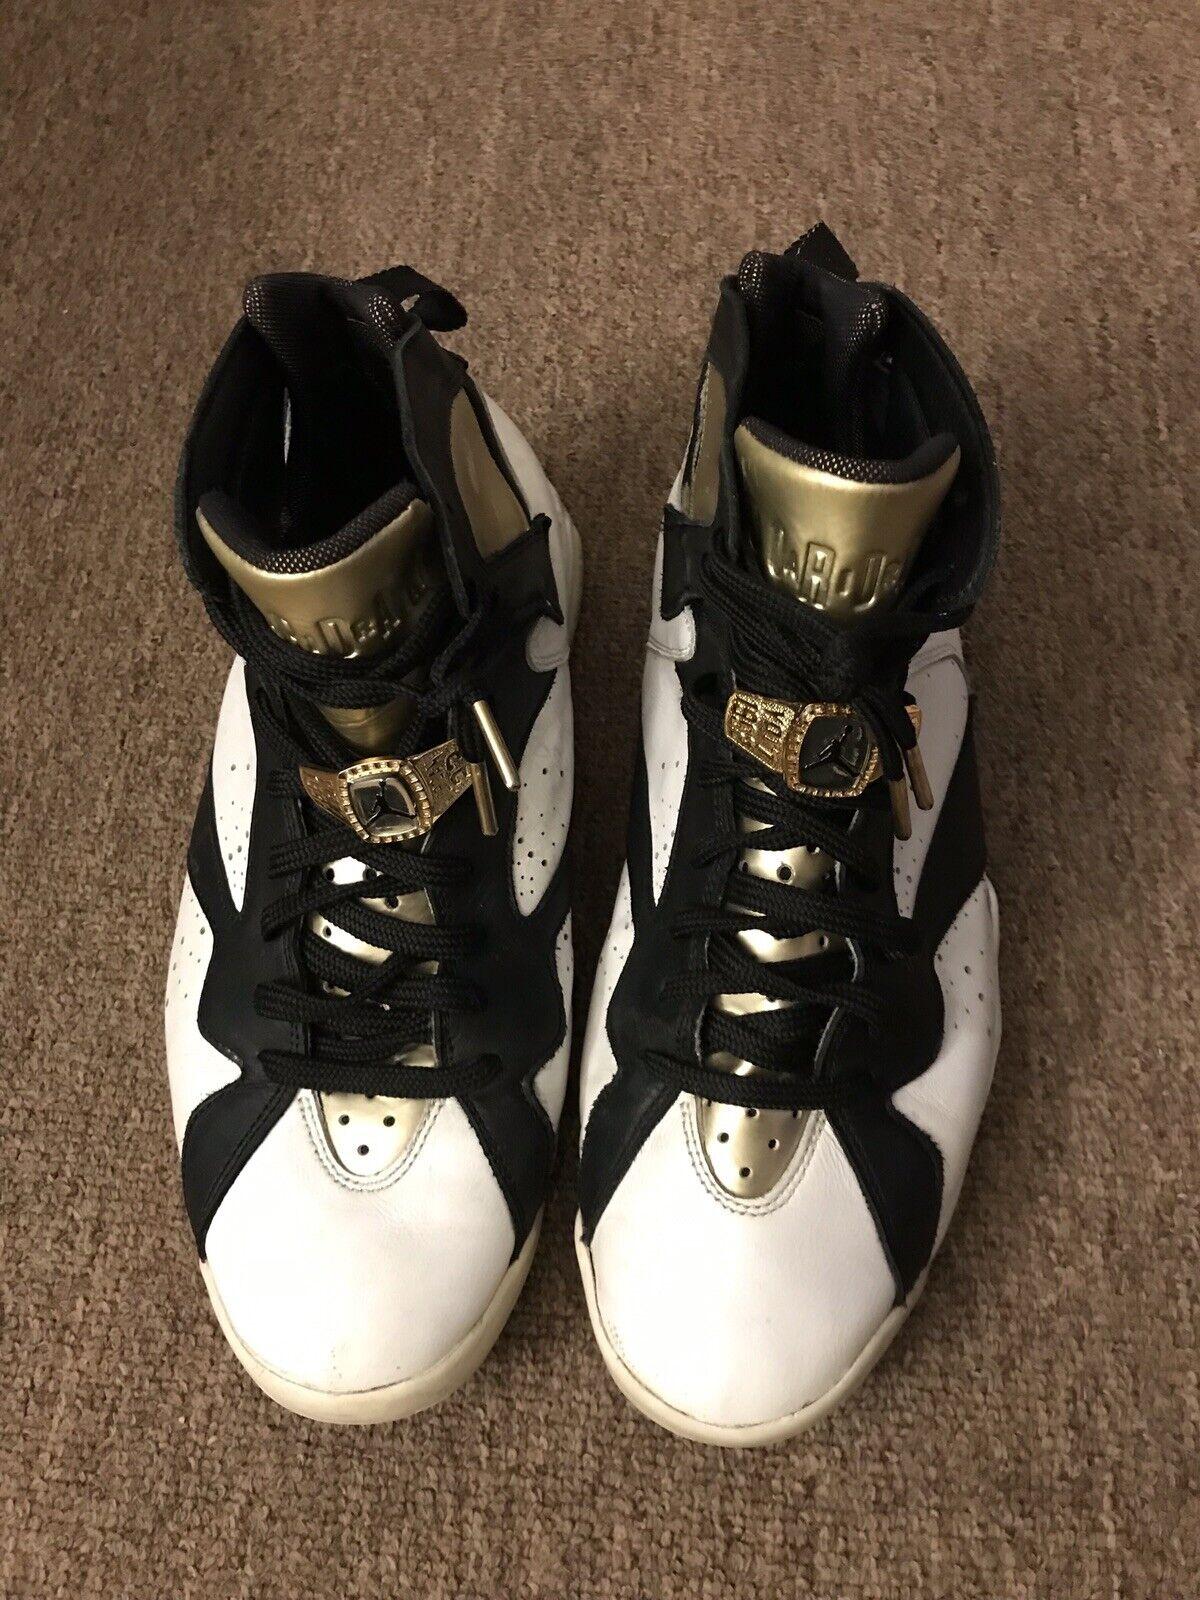 Nike Air Jordan 7 VII Retro Championship Size US 11 Men's